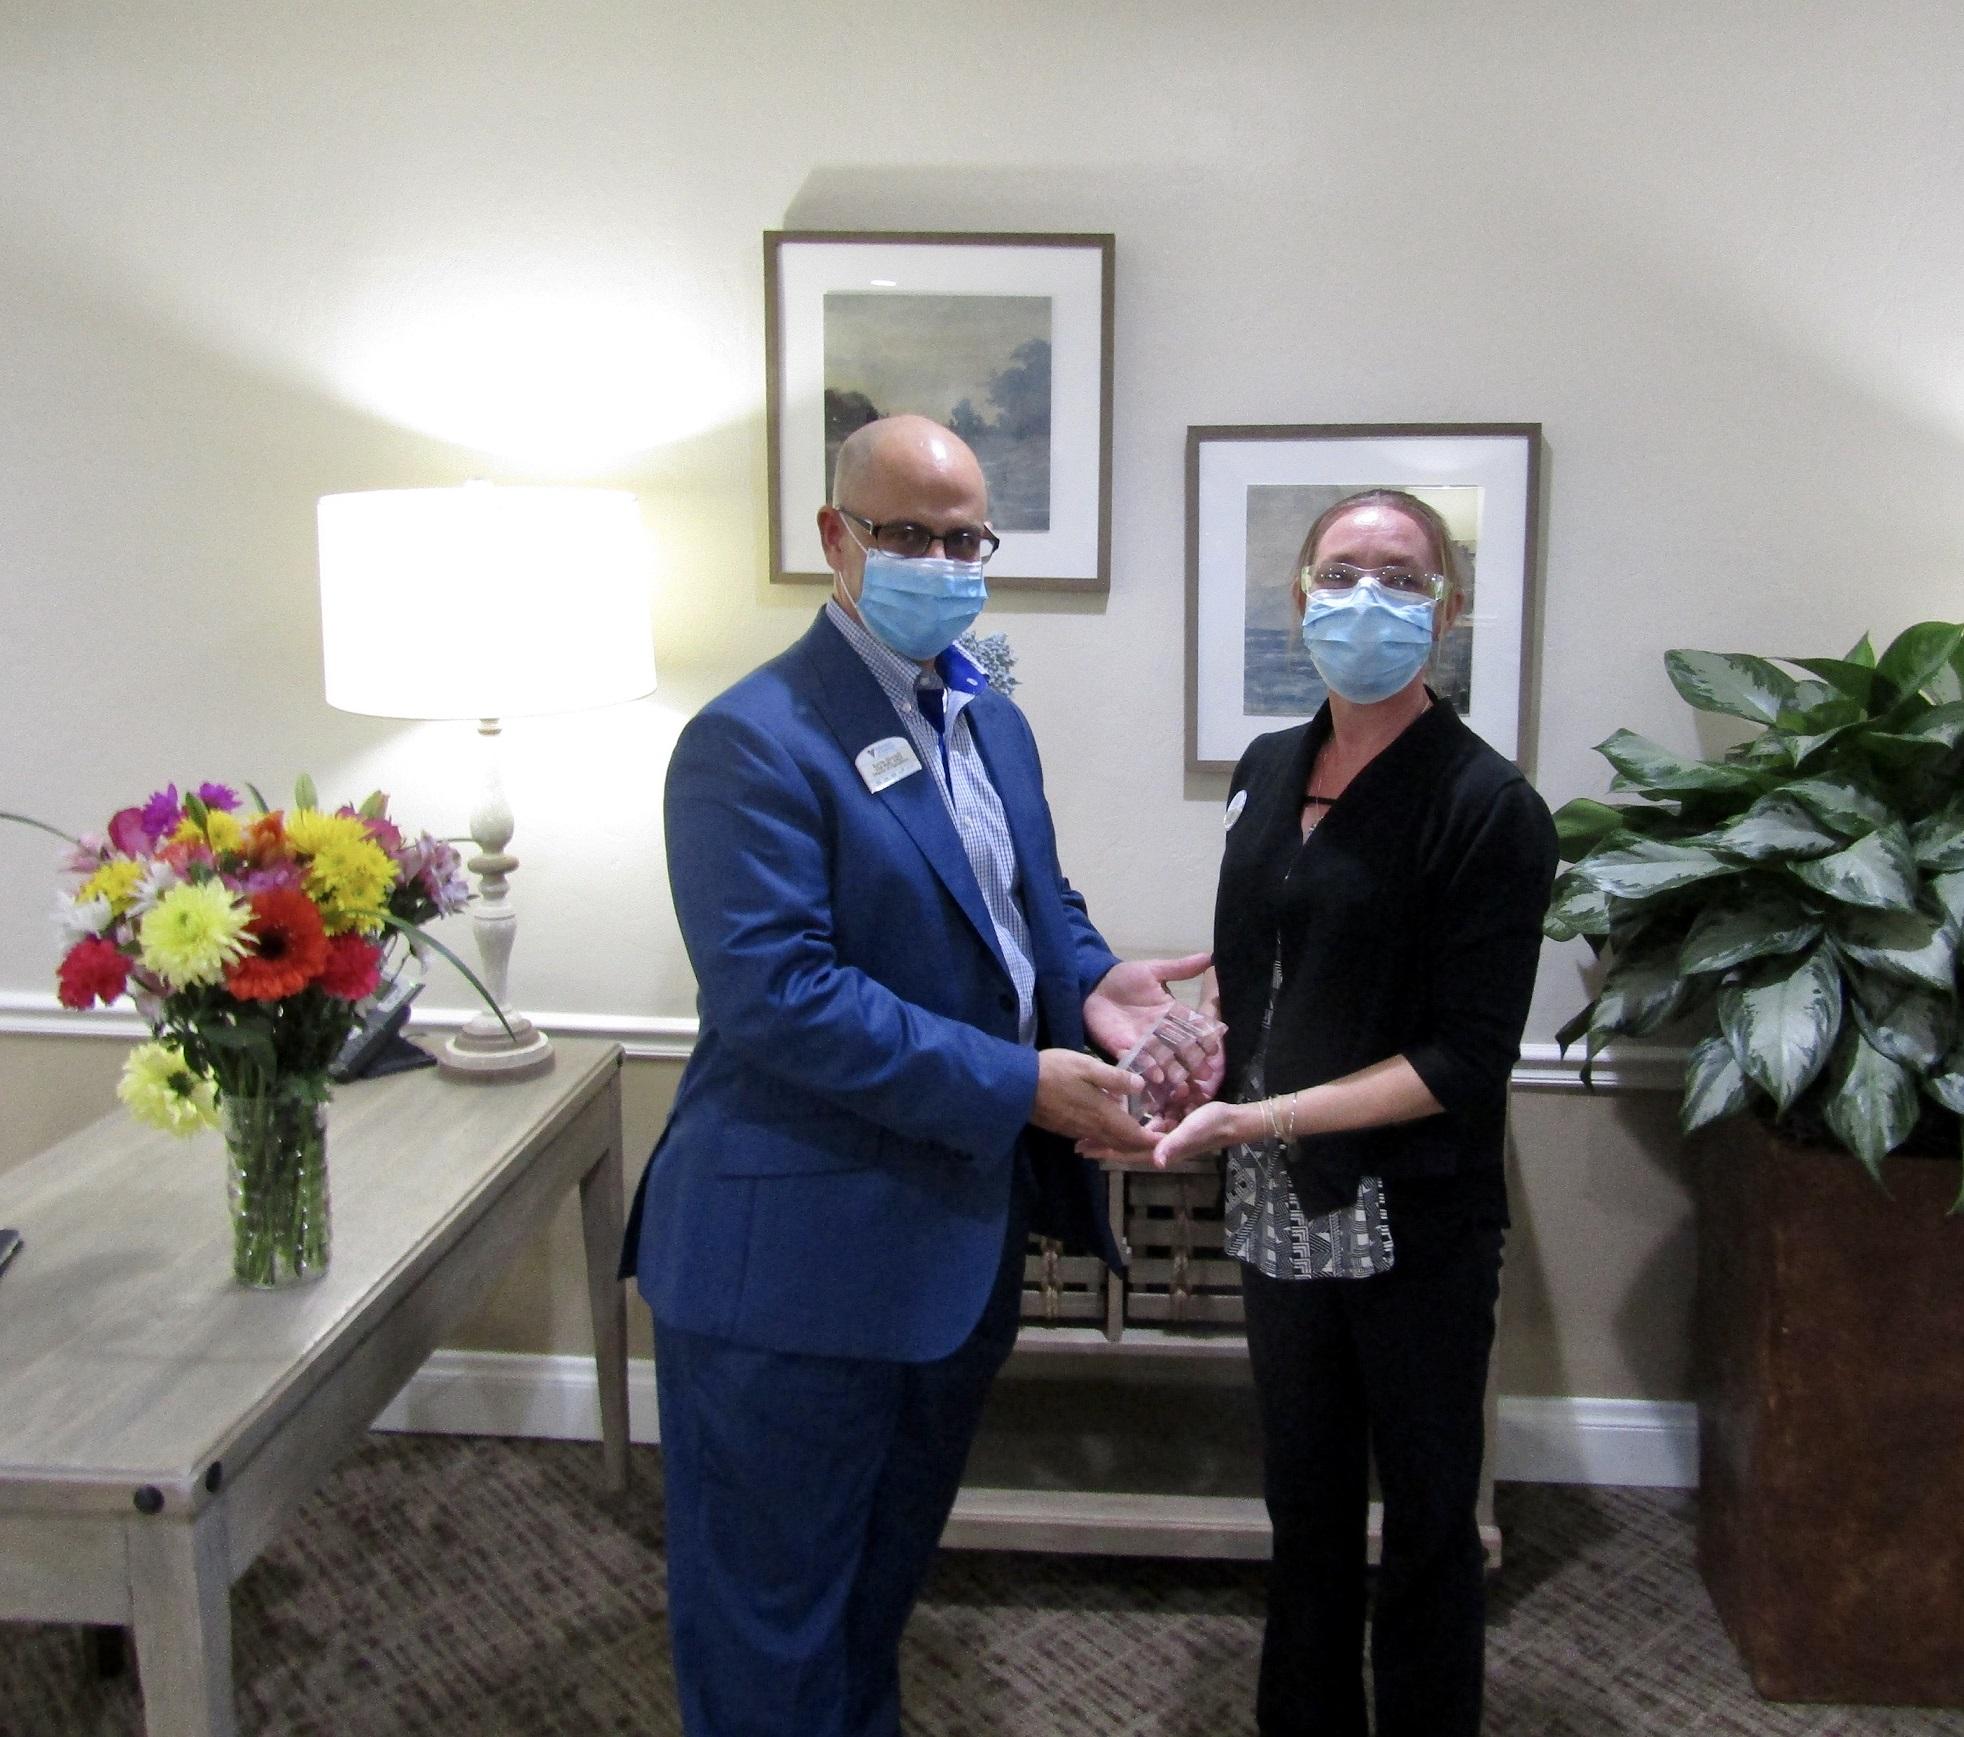 Kevin-Ahmadi-&-Jennifer-Cason-Healthcare-Hero-Award